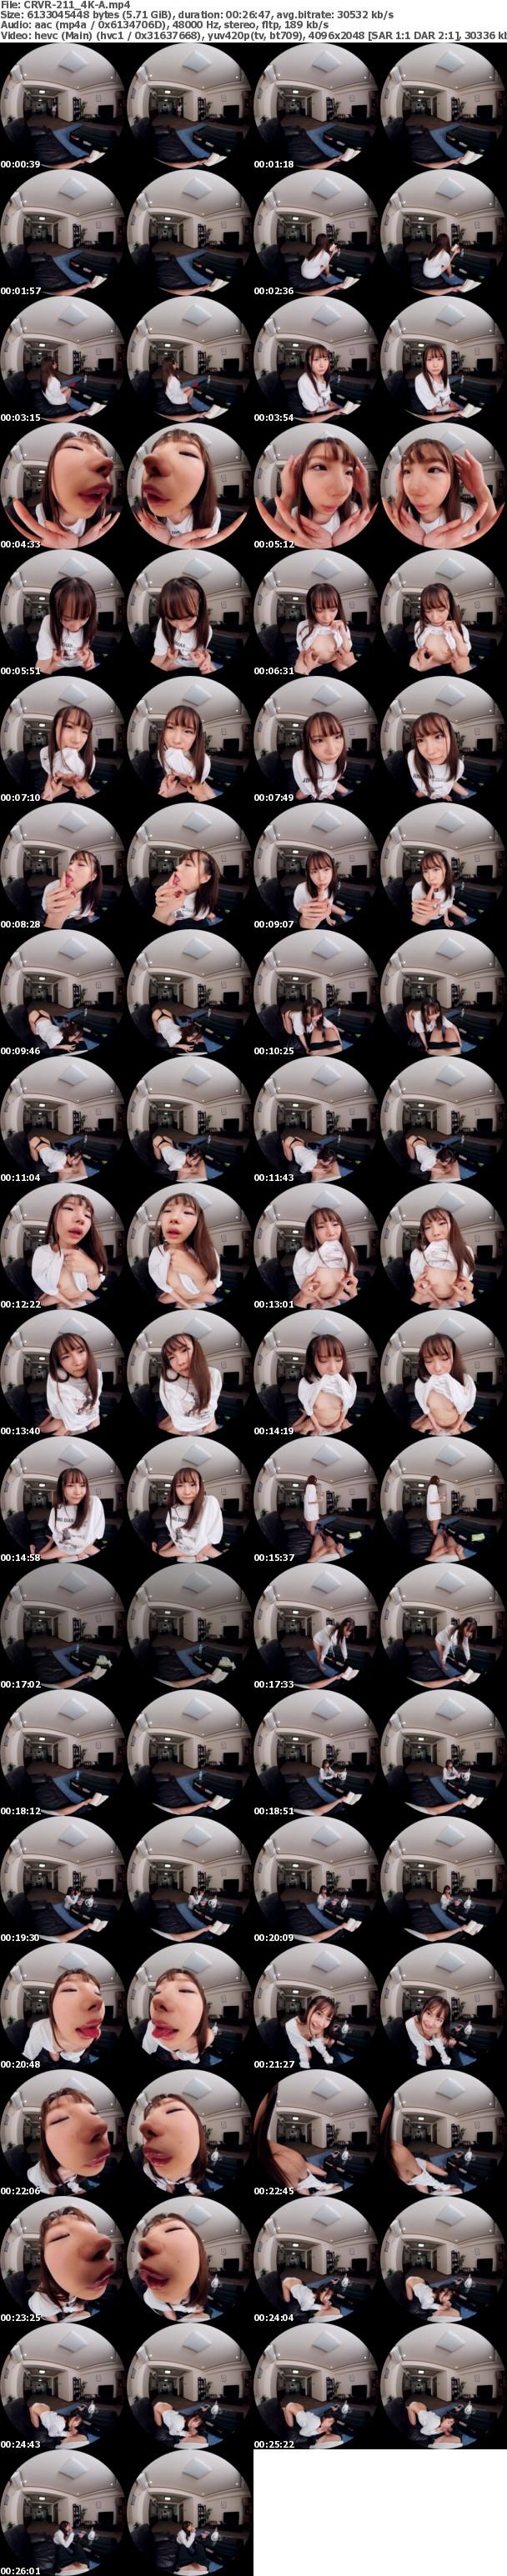 (VR) (4K) CRVR-211 松本いちか 目があうと無言でボクのからだを求めてくるスレンダーで美尻な姉との二人っきりな休日。